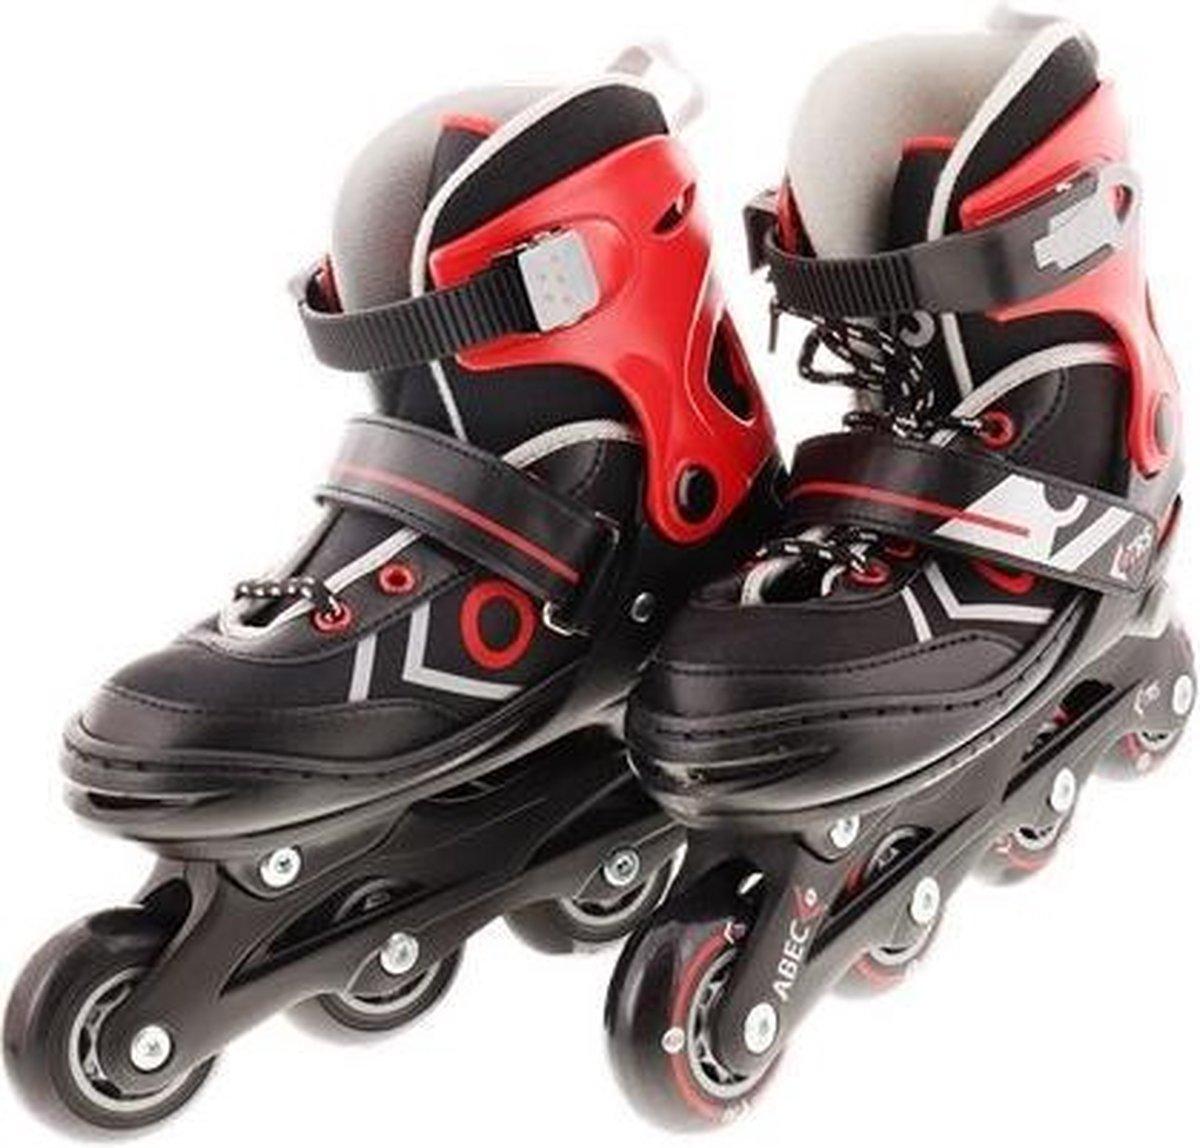 Verstelbare inline skates (MAAT 34 - 37) Buitensport skates Zwart/Rood